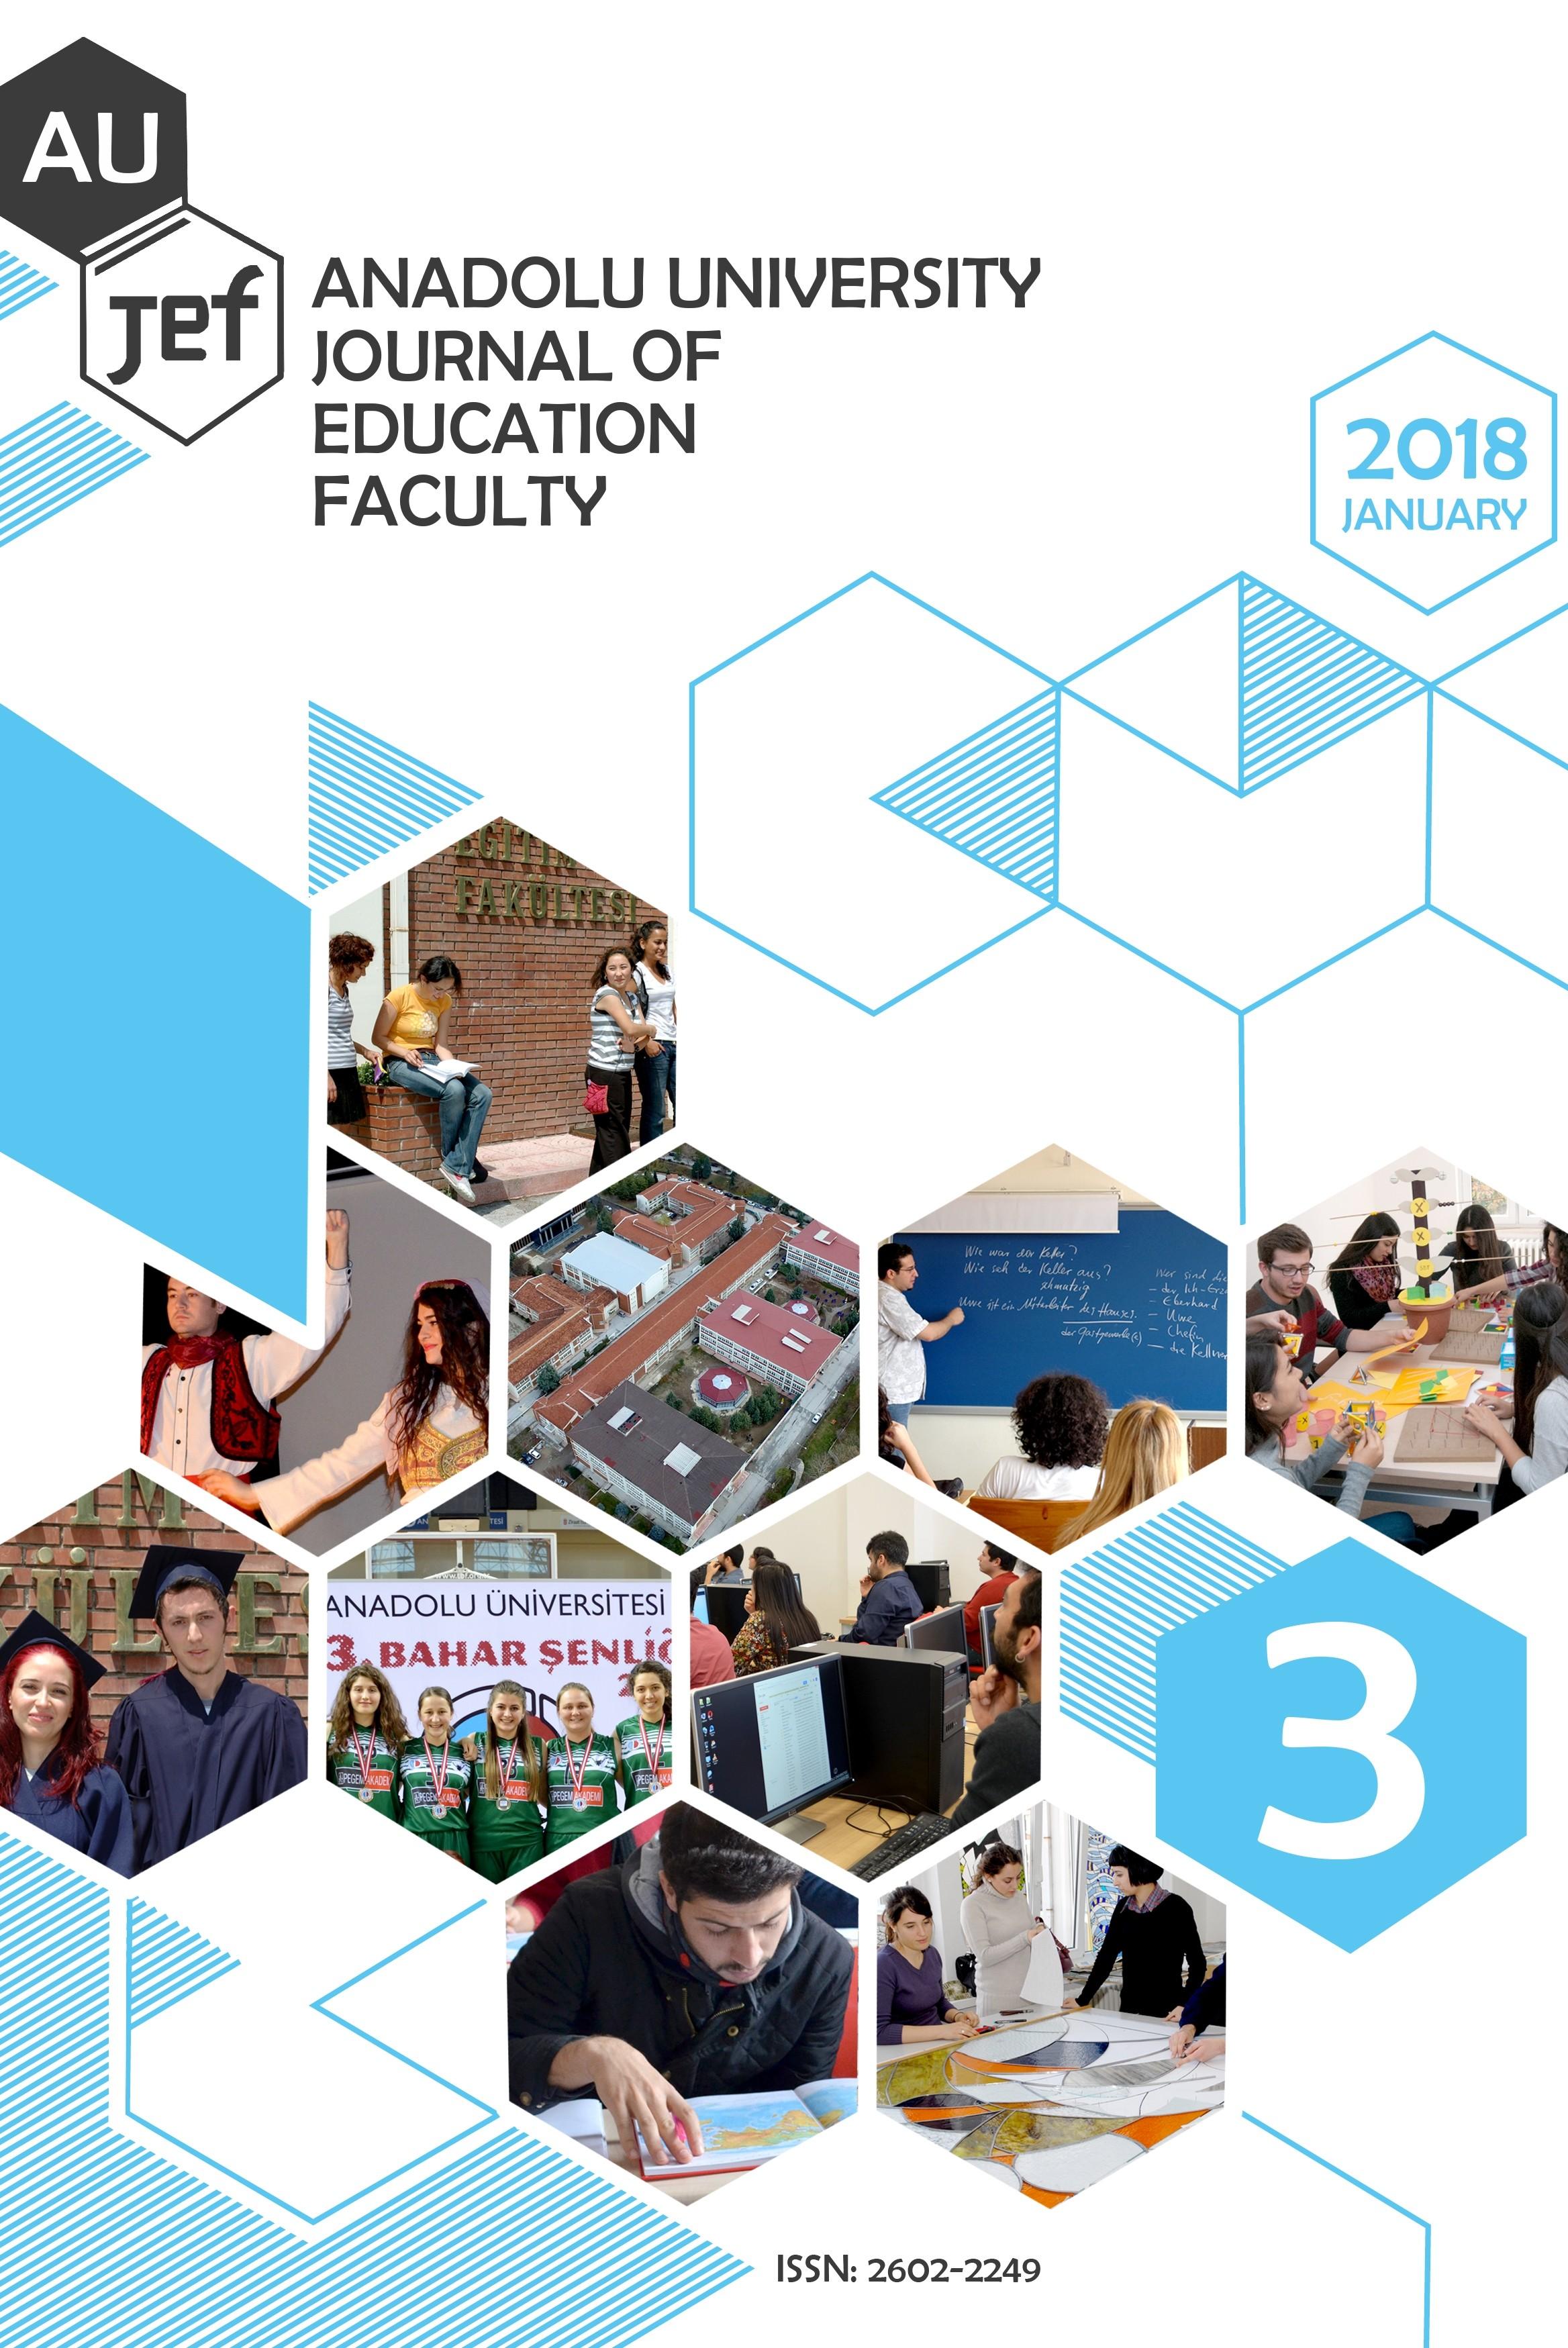 Anadolu University Journal of Education Faculty